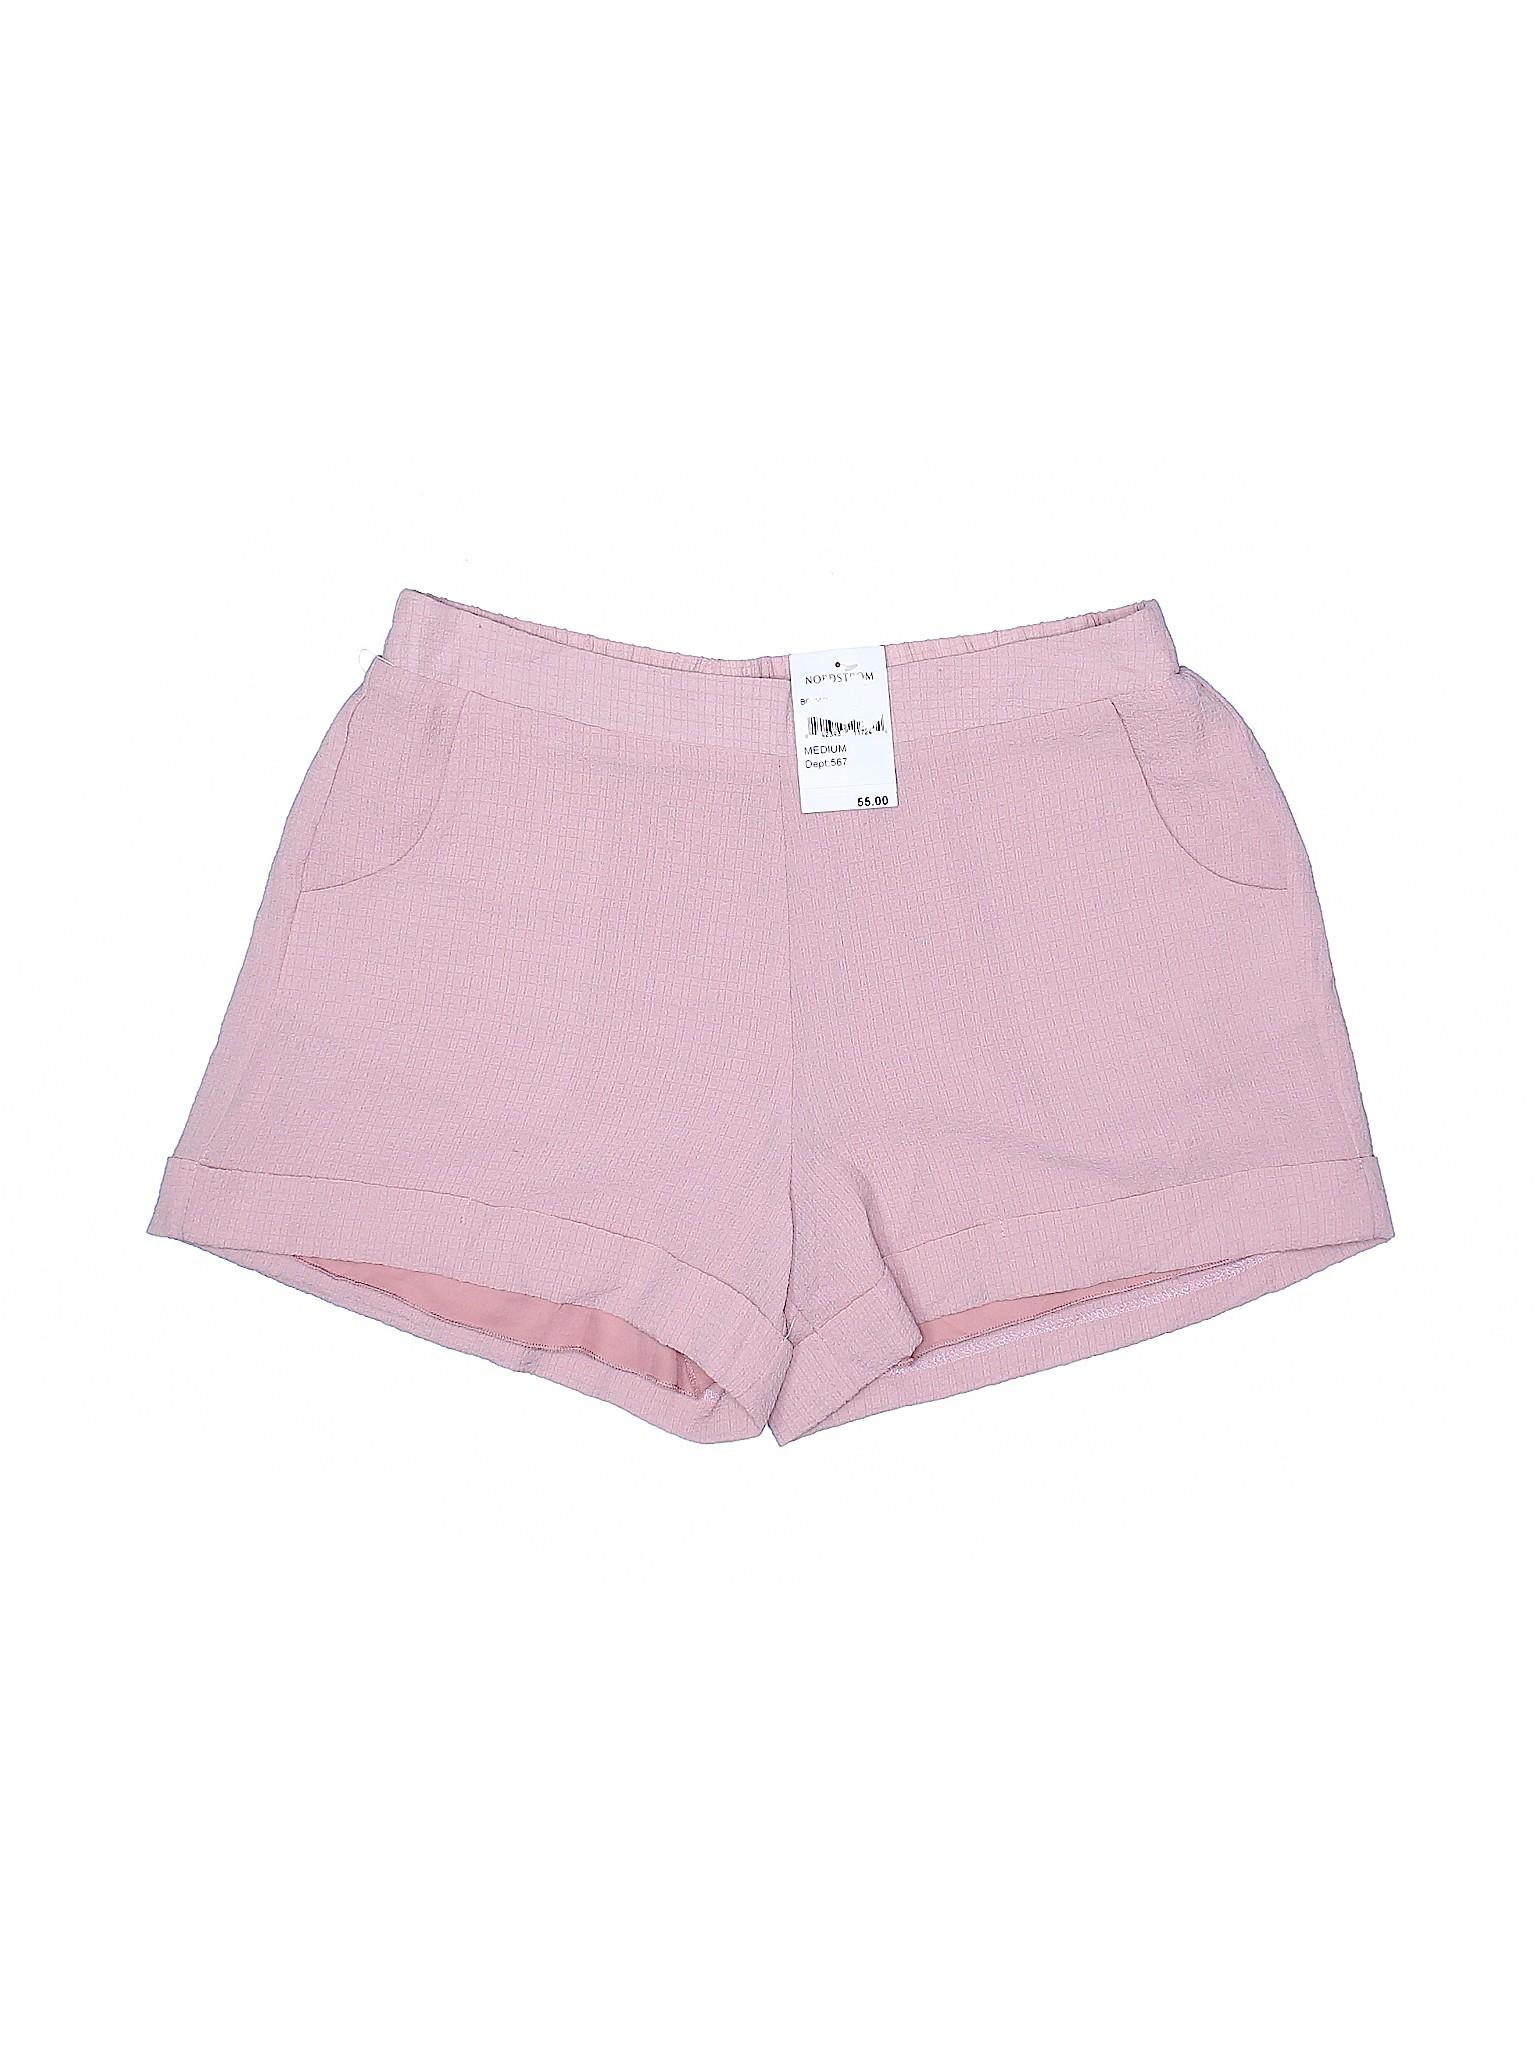 Shorts 4SI3NNA 4SI3NNA Boutique Boutique 4SI3NNA Boutique Boutique Shorts Shorts AZwF5qB